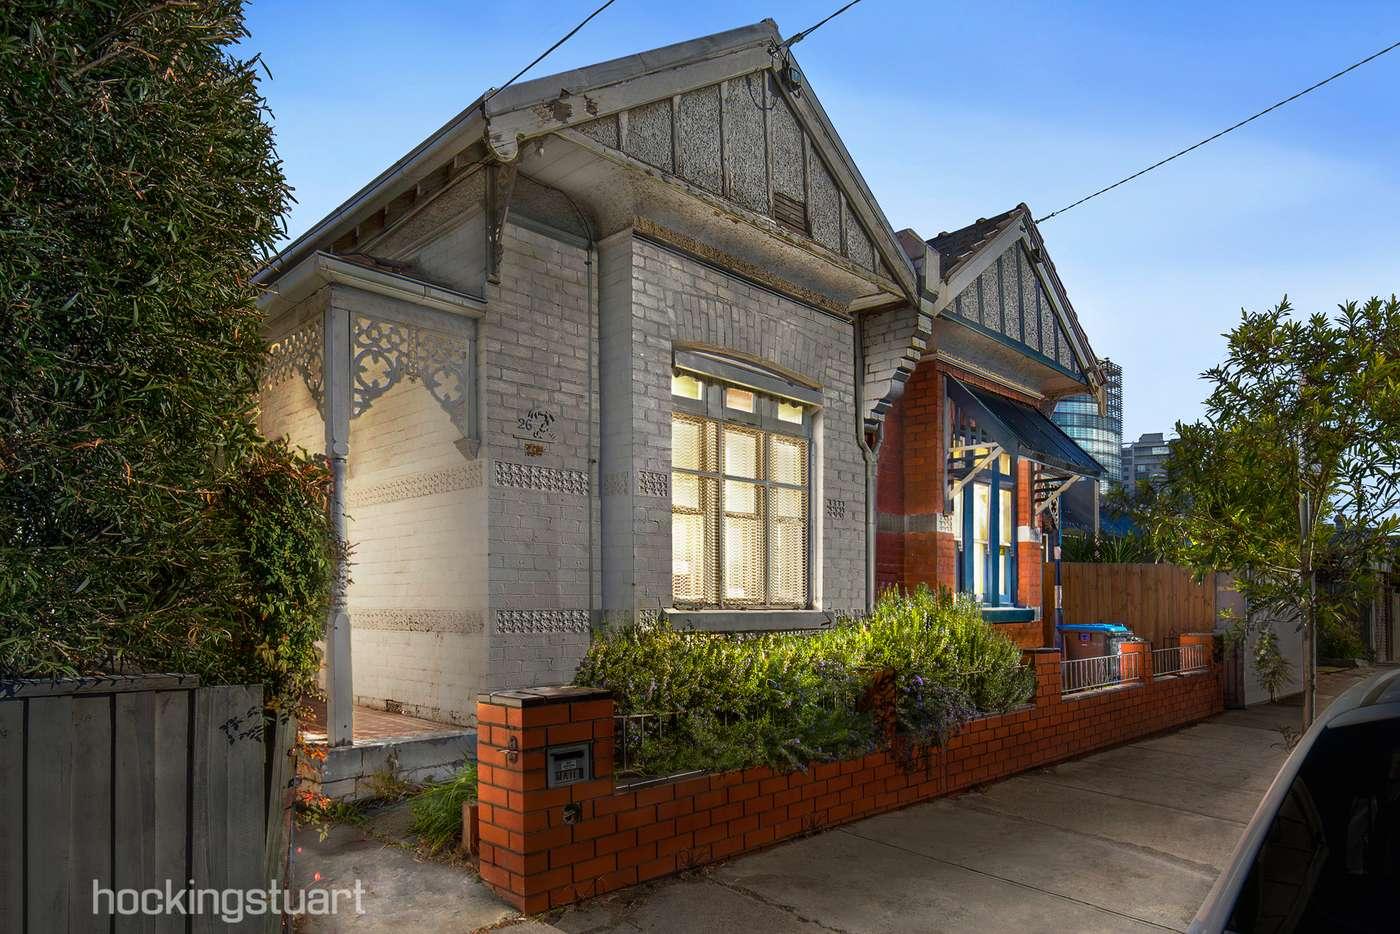 Main view of Homely house listing, 26 Union Street, Prahran VIC 3181